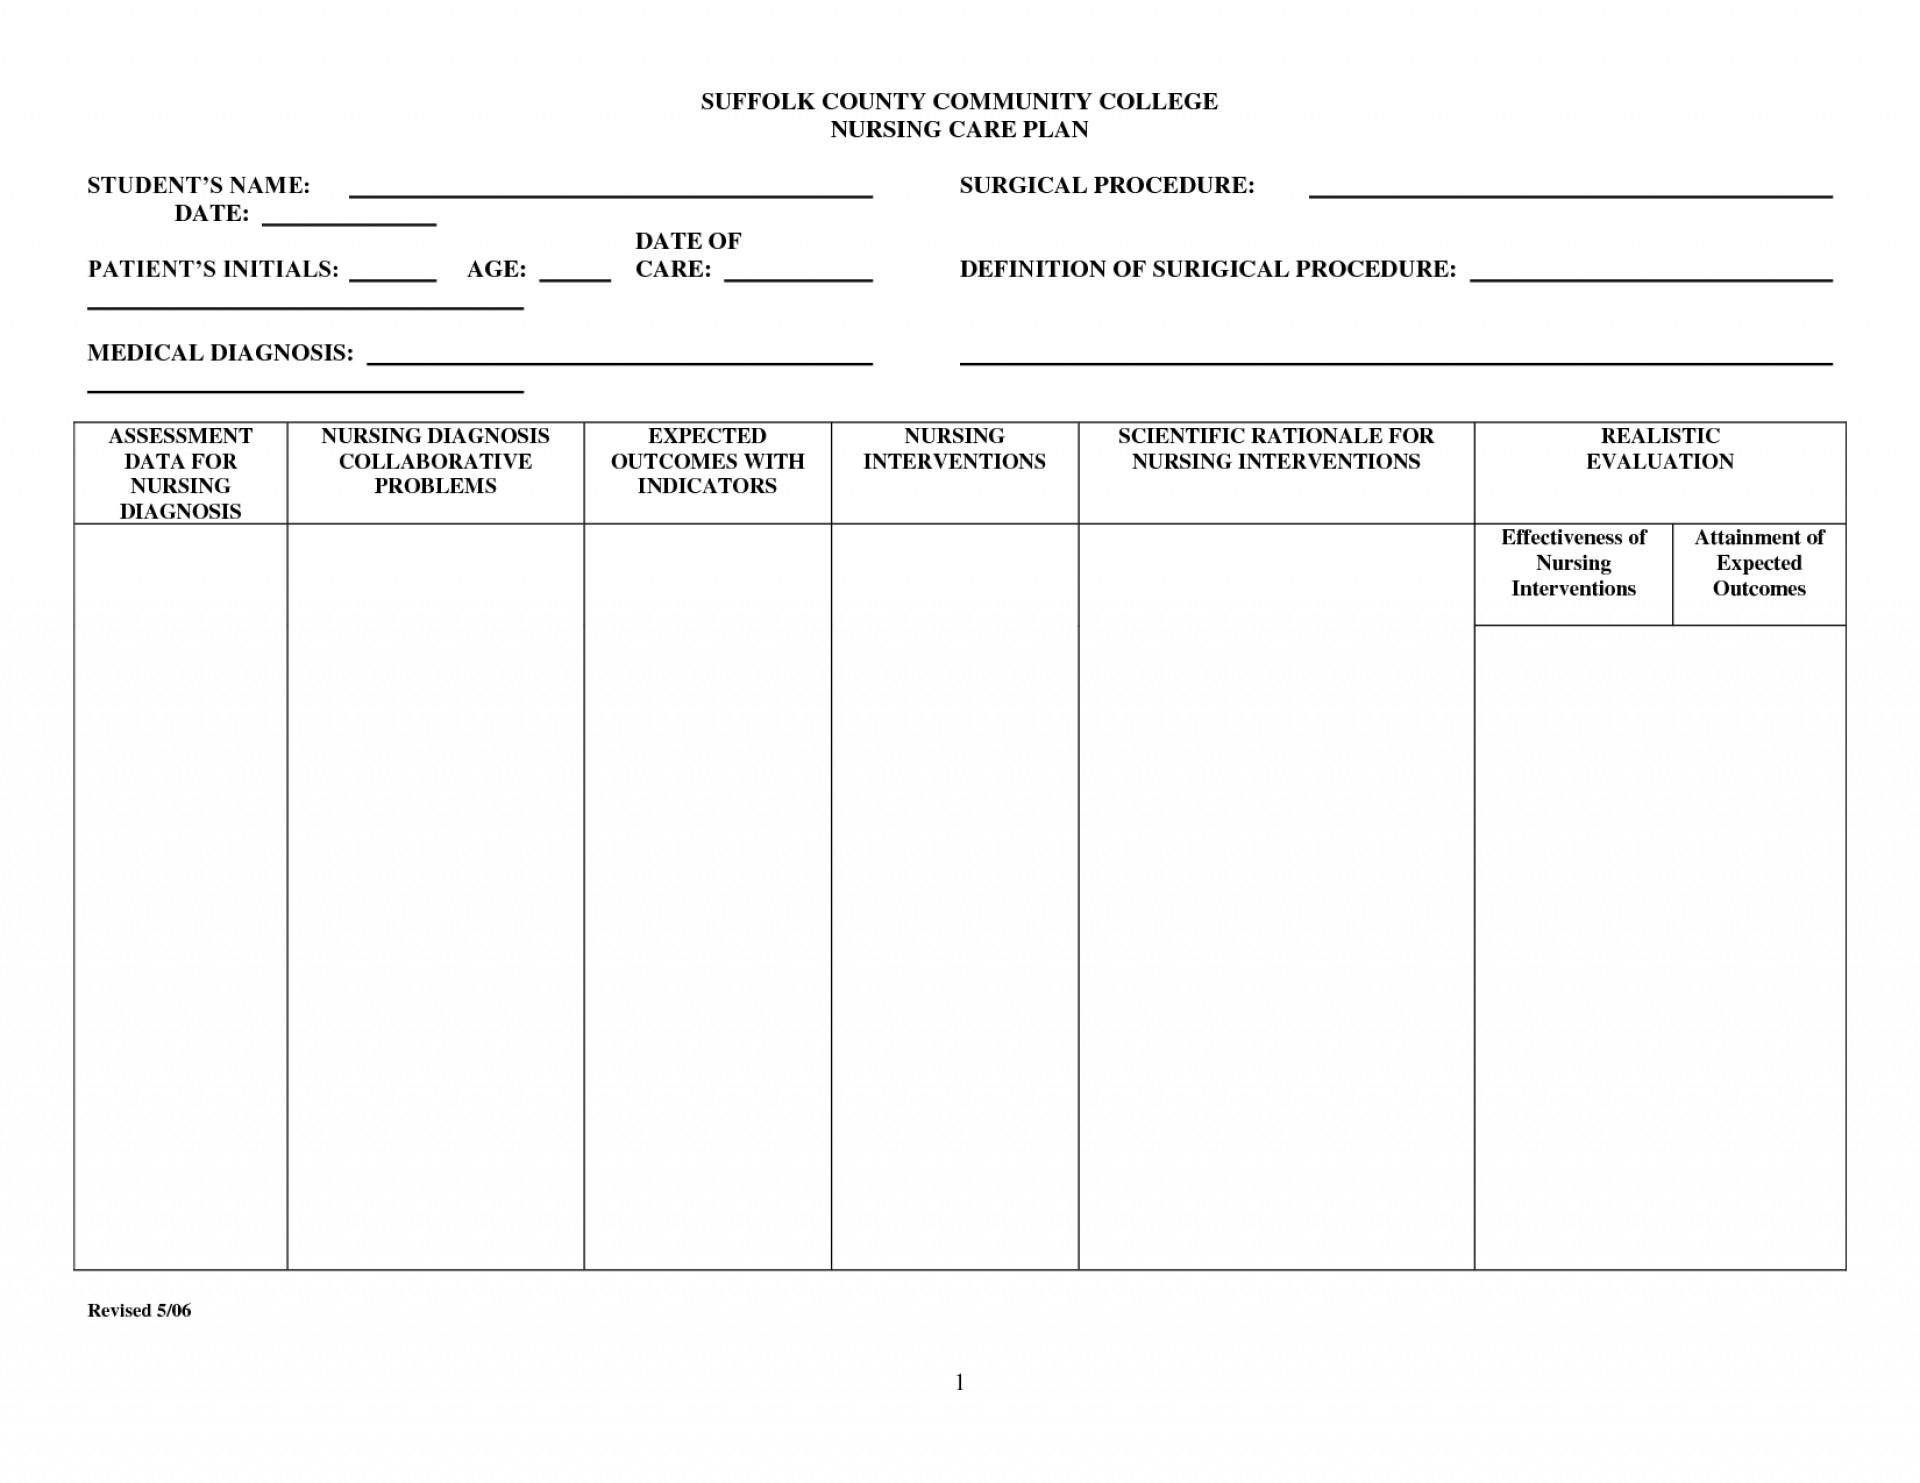 002 Nursing Care Plan Template Incredible Ideas Blank Pdf Plans - Free Printable Blank Nursing Care Plan